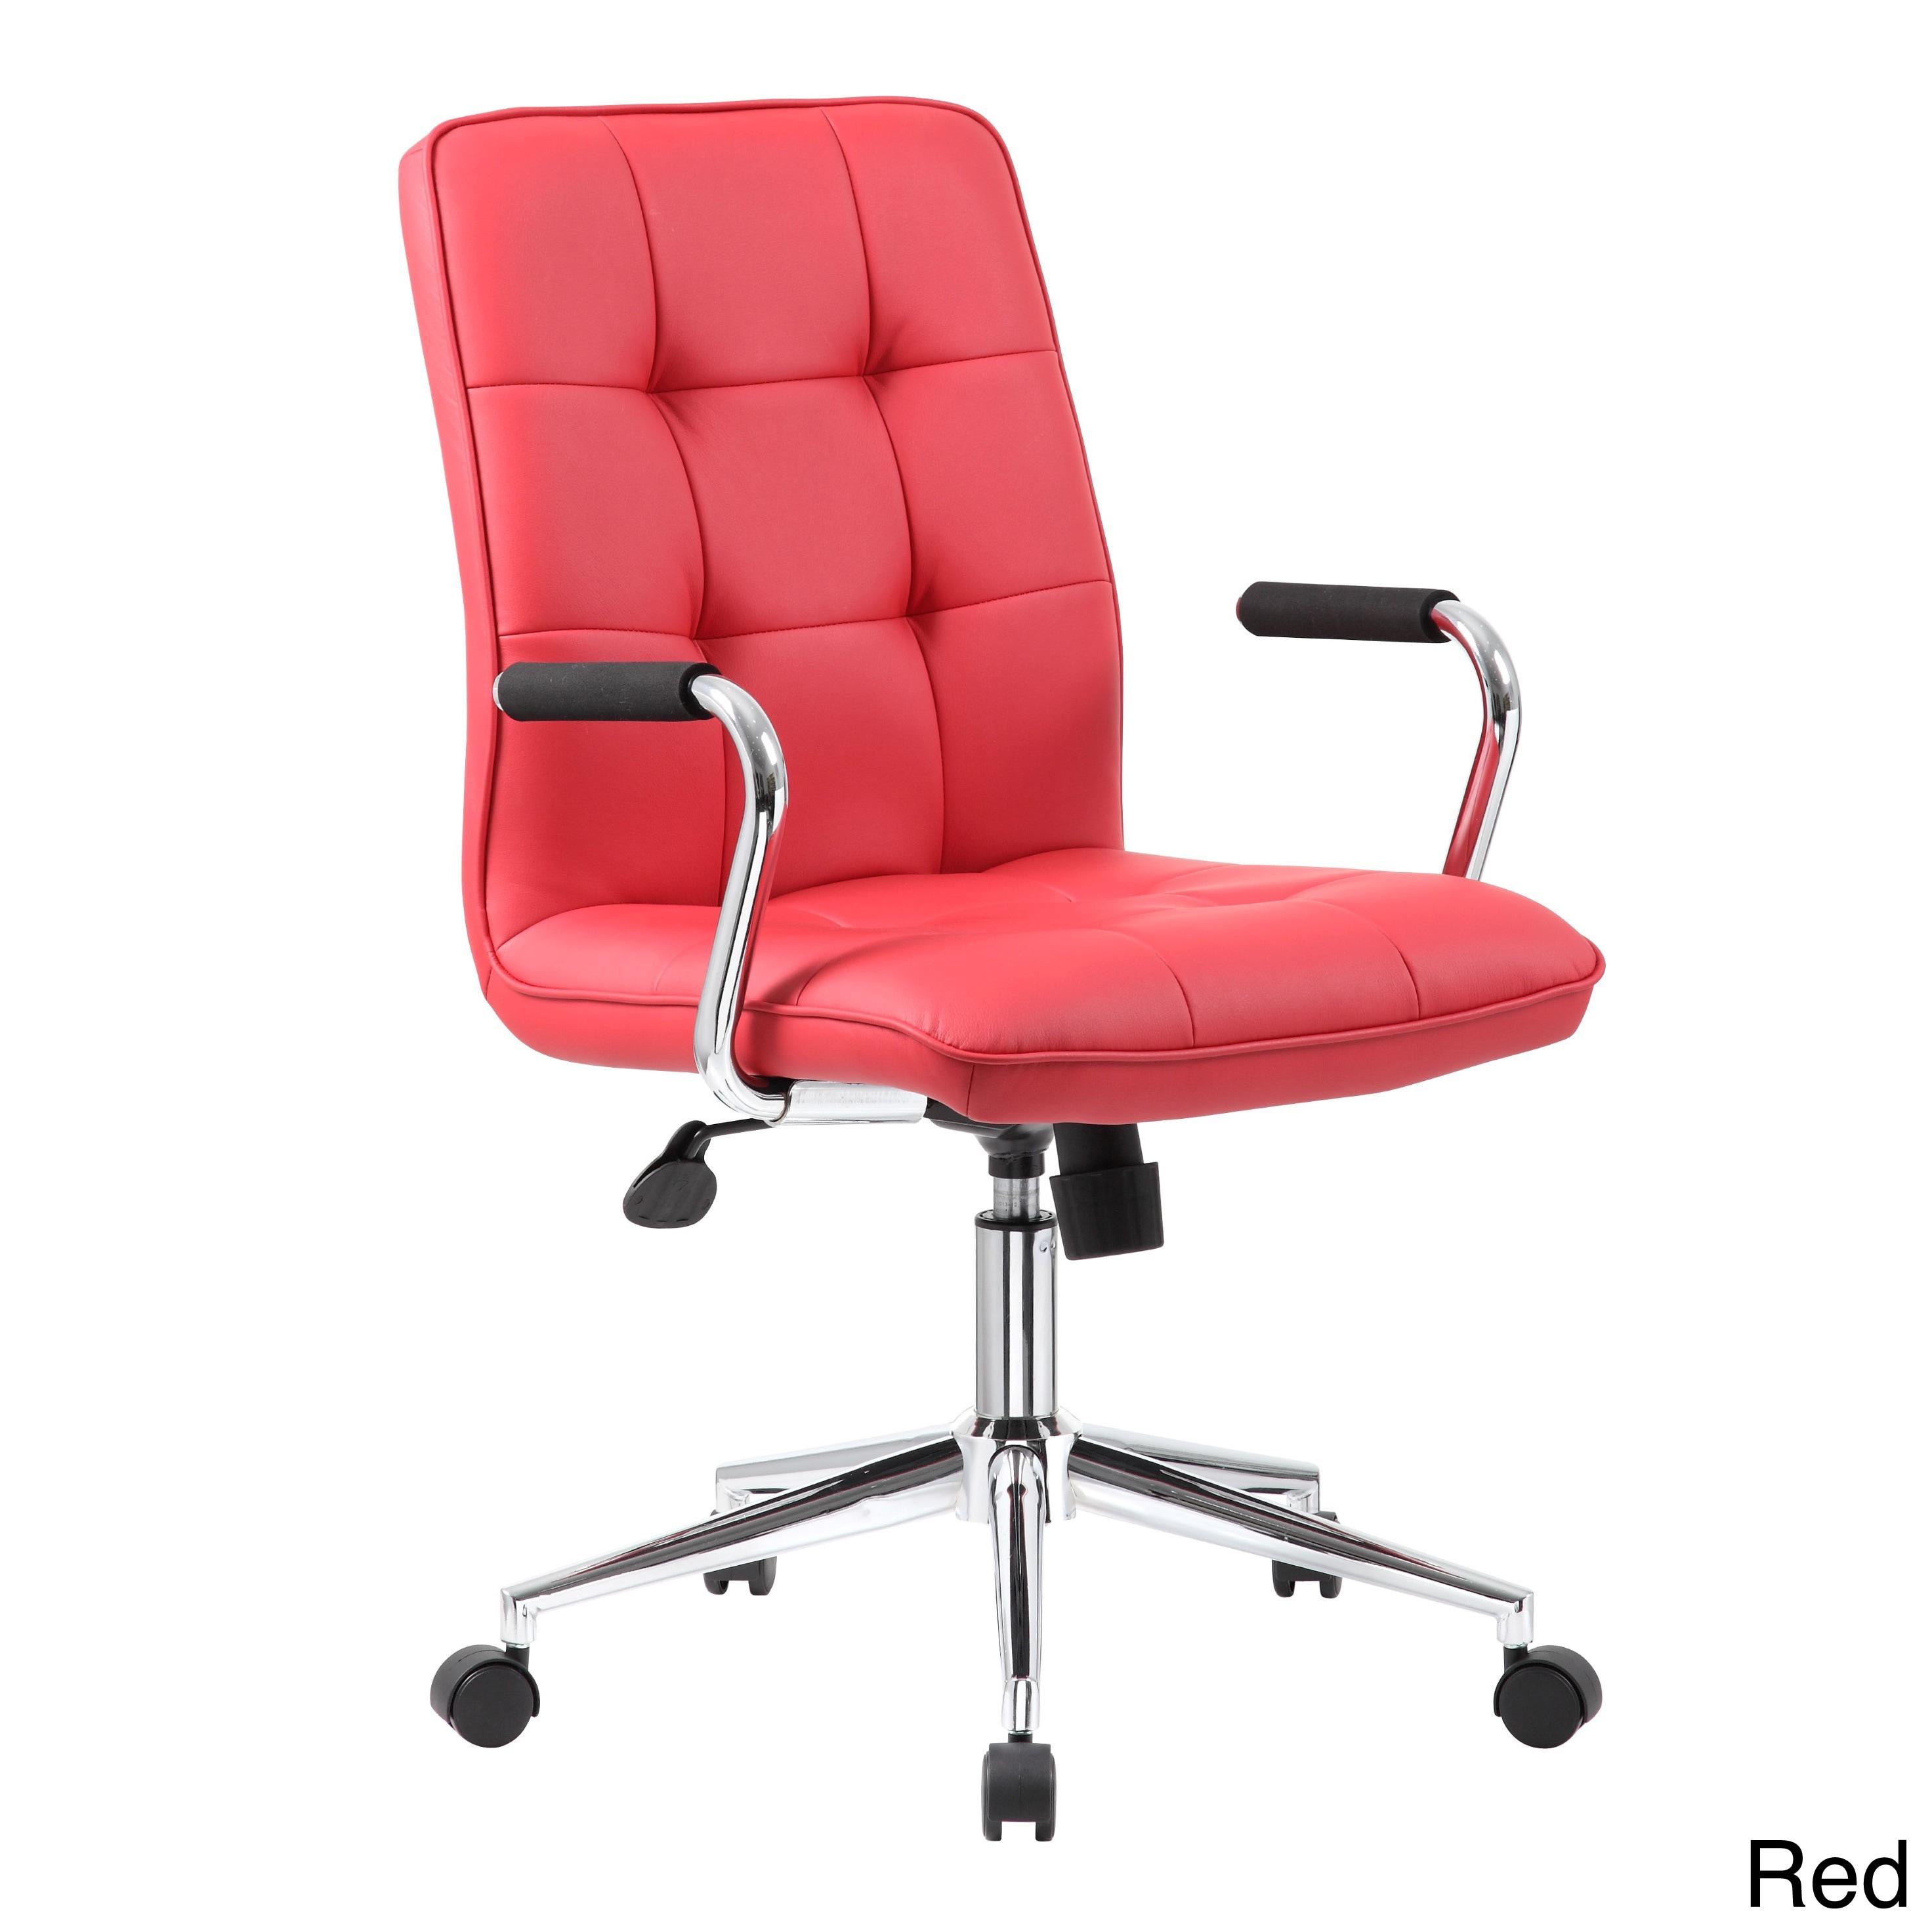 Modern Office Chair Overstock Shopping Great Deals On Boss Office